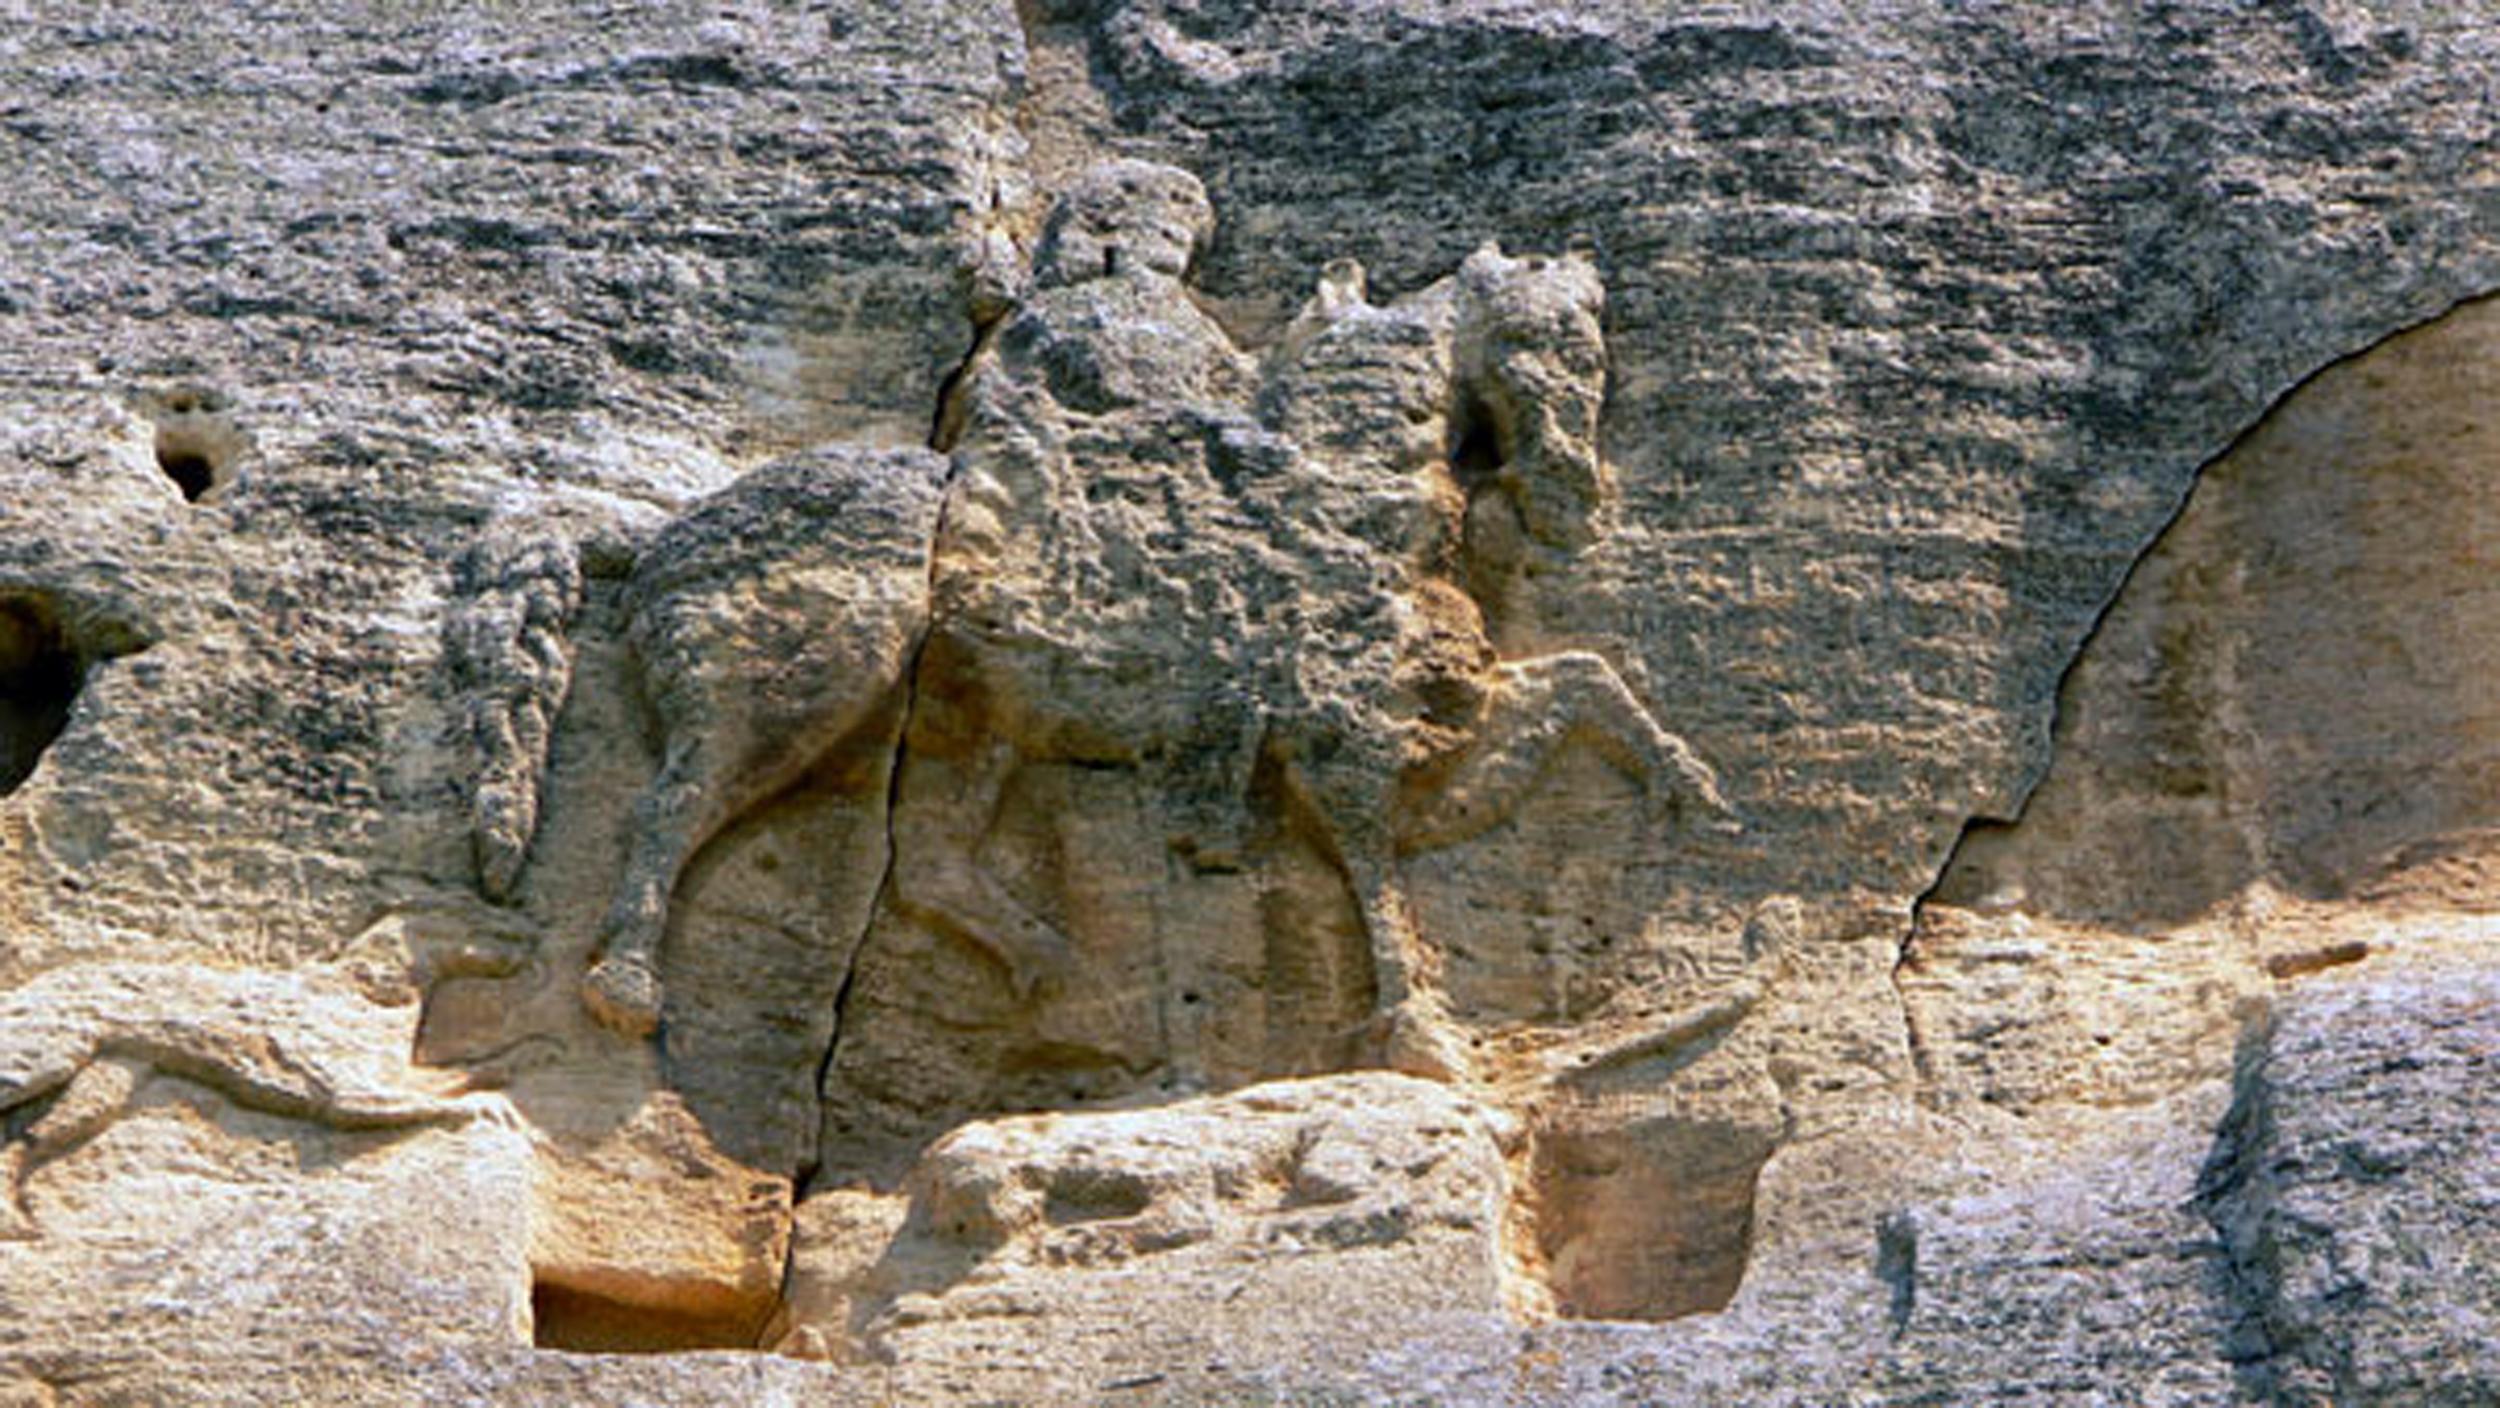 4.3.3.5. The Madara Horseman